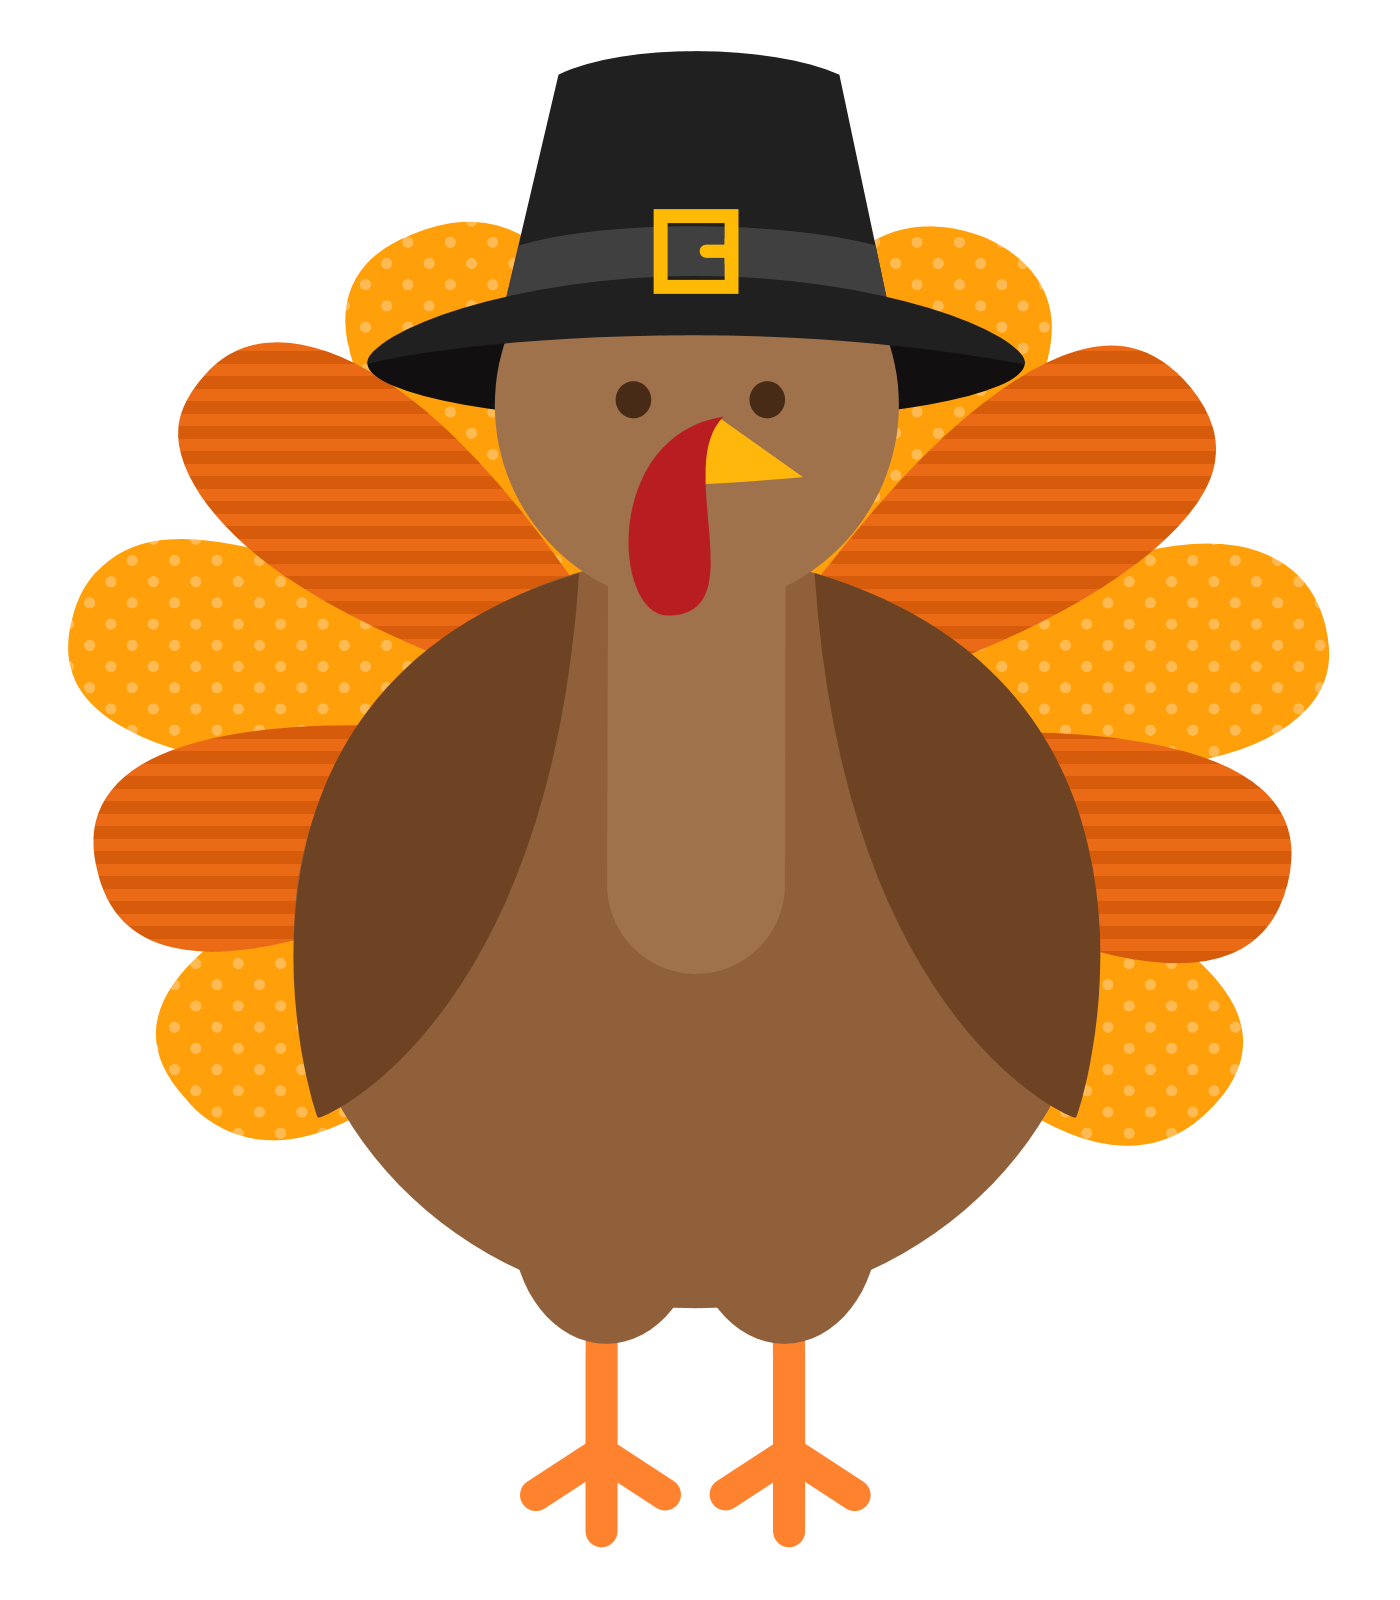 Thanksgiving Turkey Photos .-Thanksgiving Turkey Photos .-9